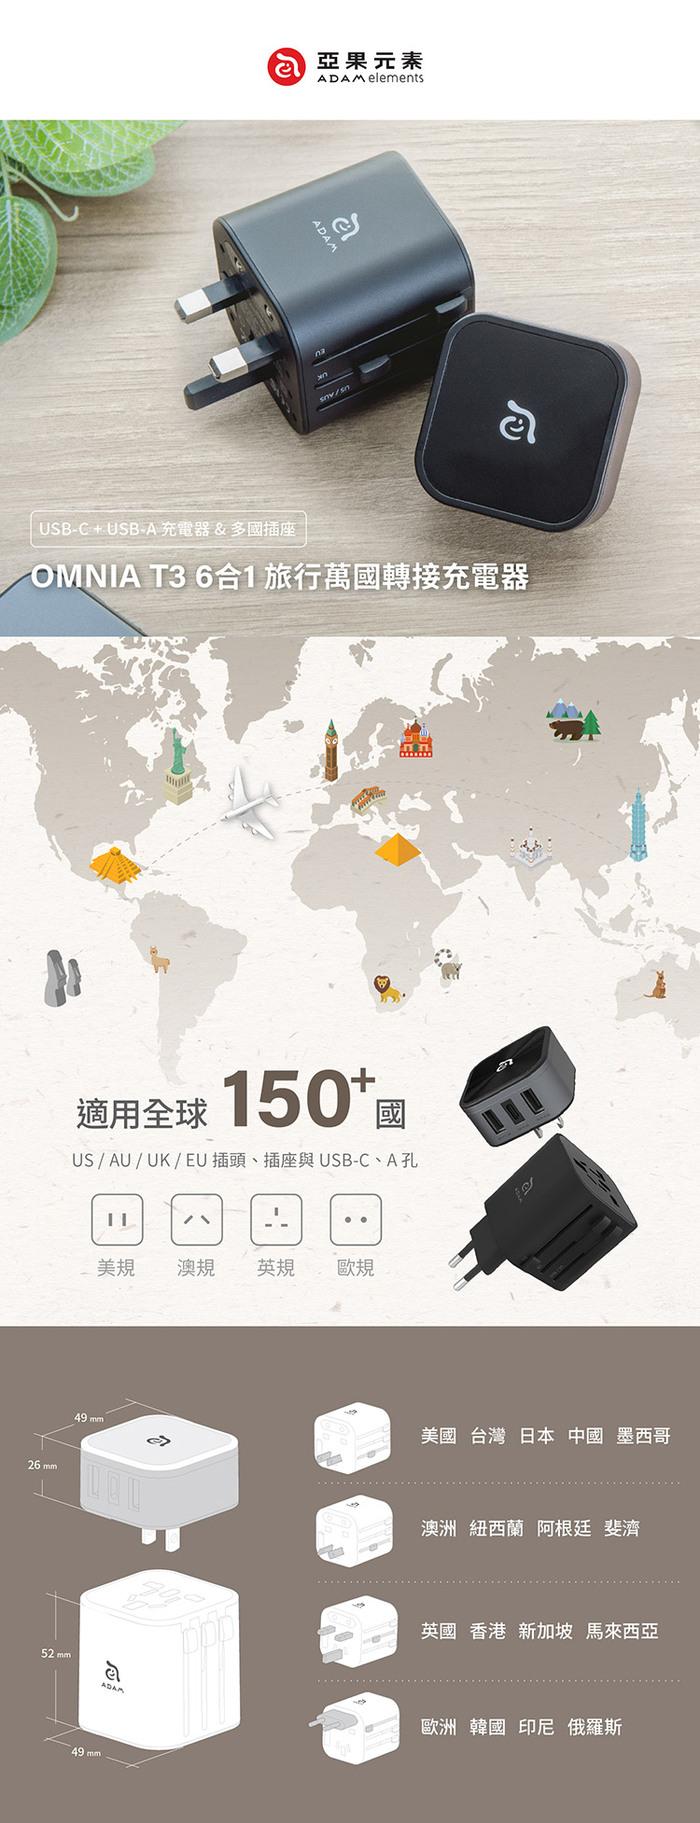 OMNIA T3 多功能 6 合 1 旅行萬國轉接頭充電器